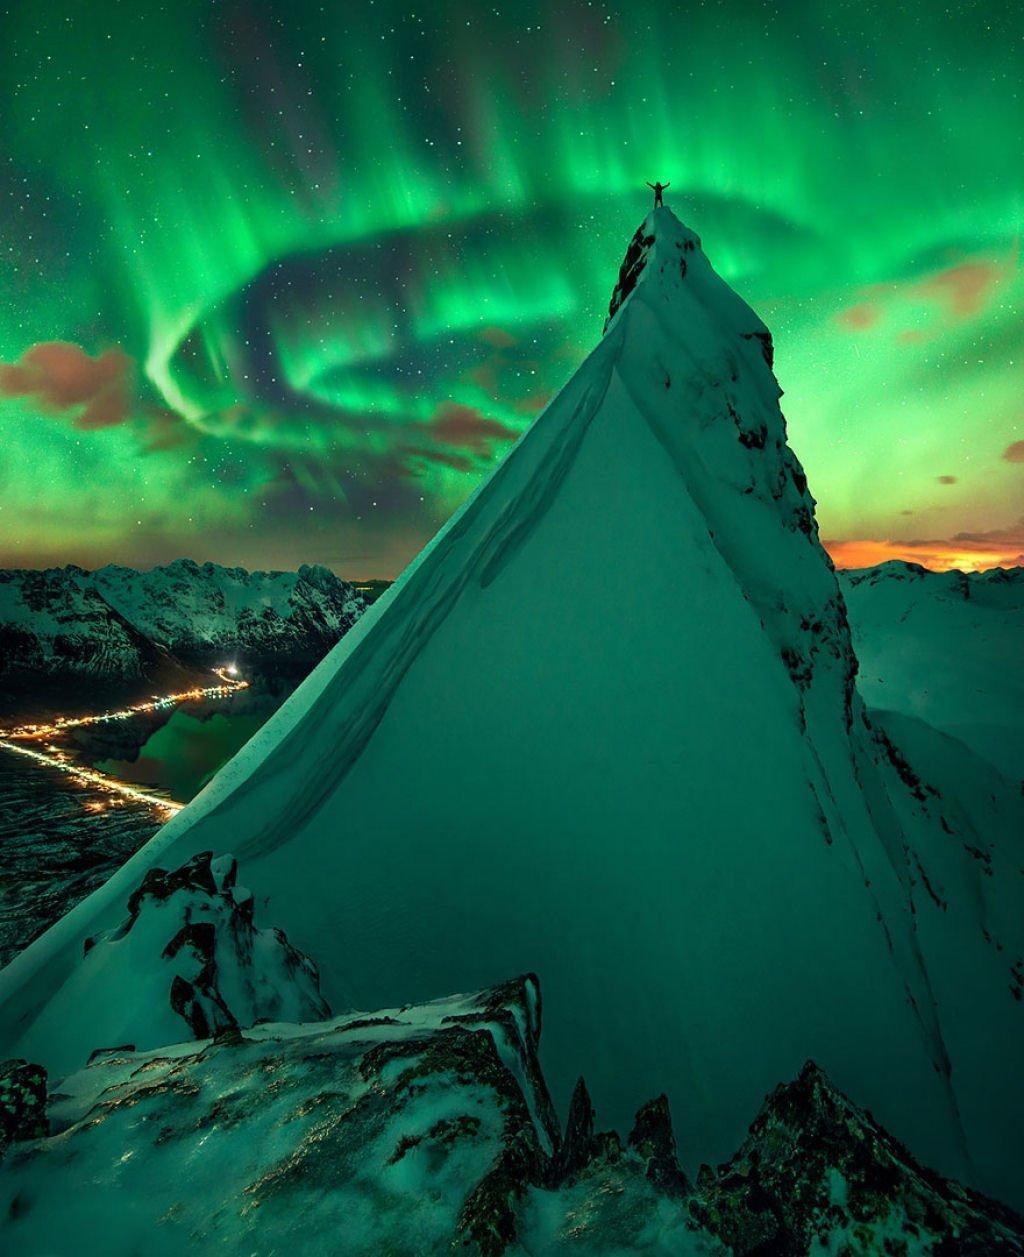 Próximo destino, Noruega, imagenes 01